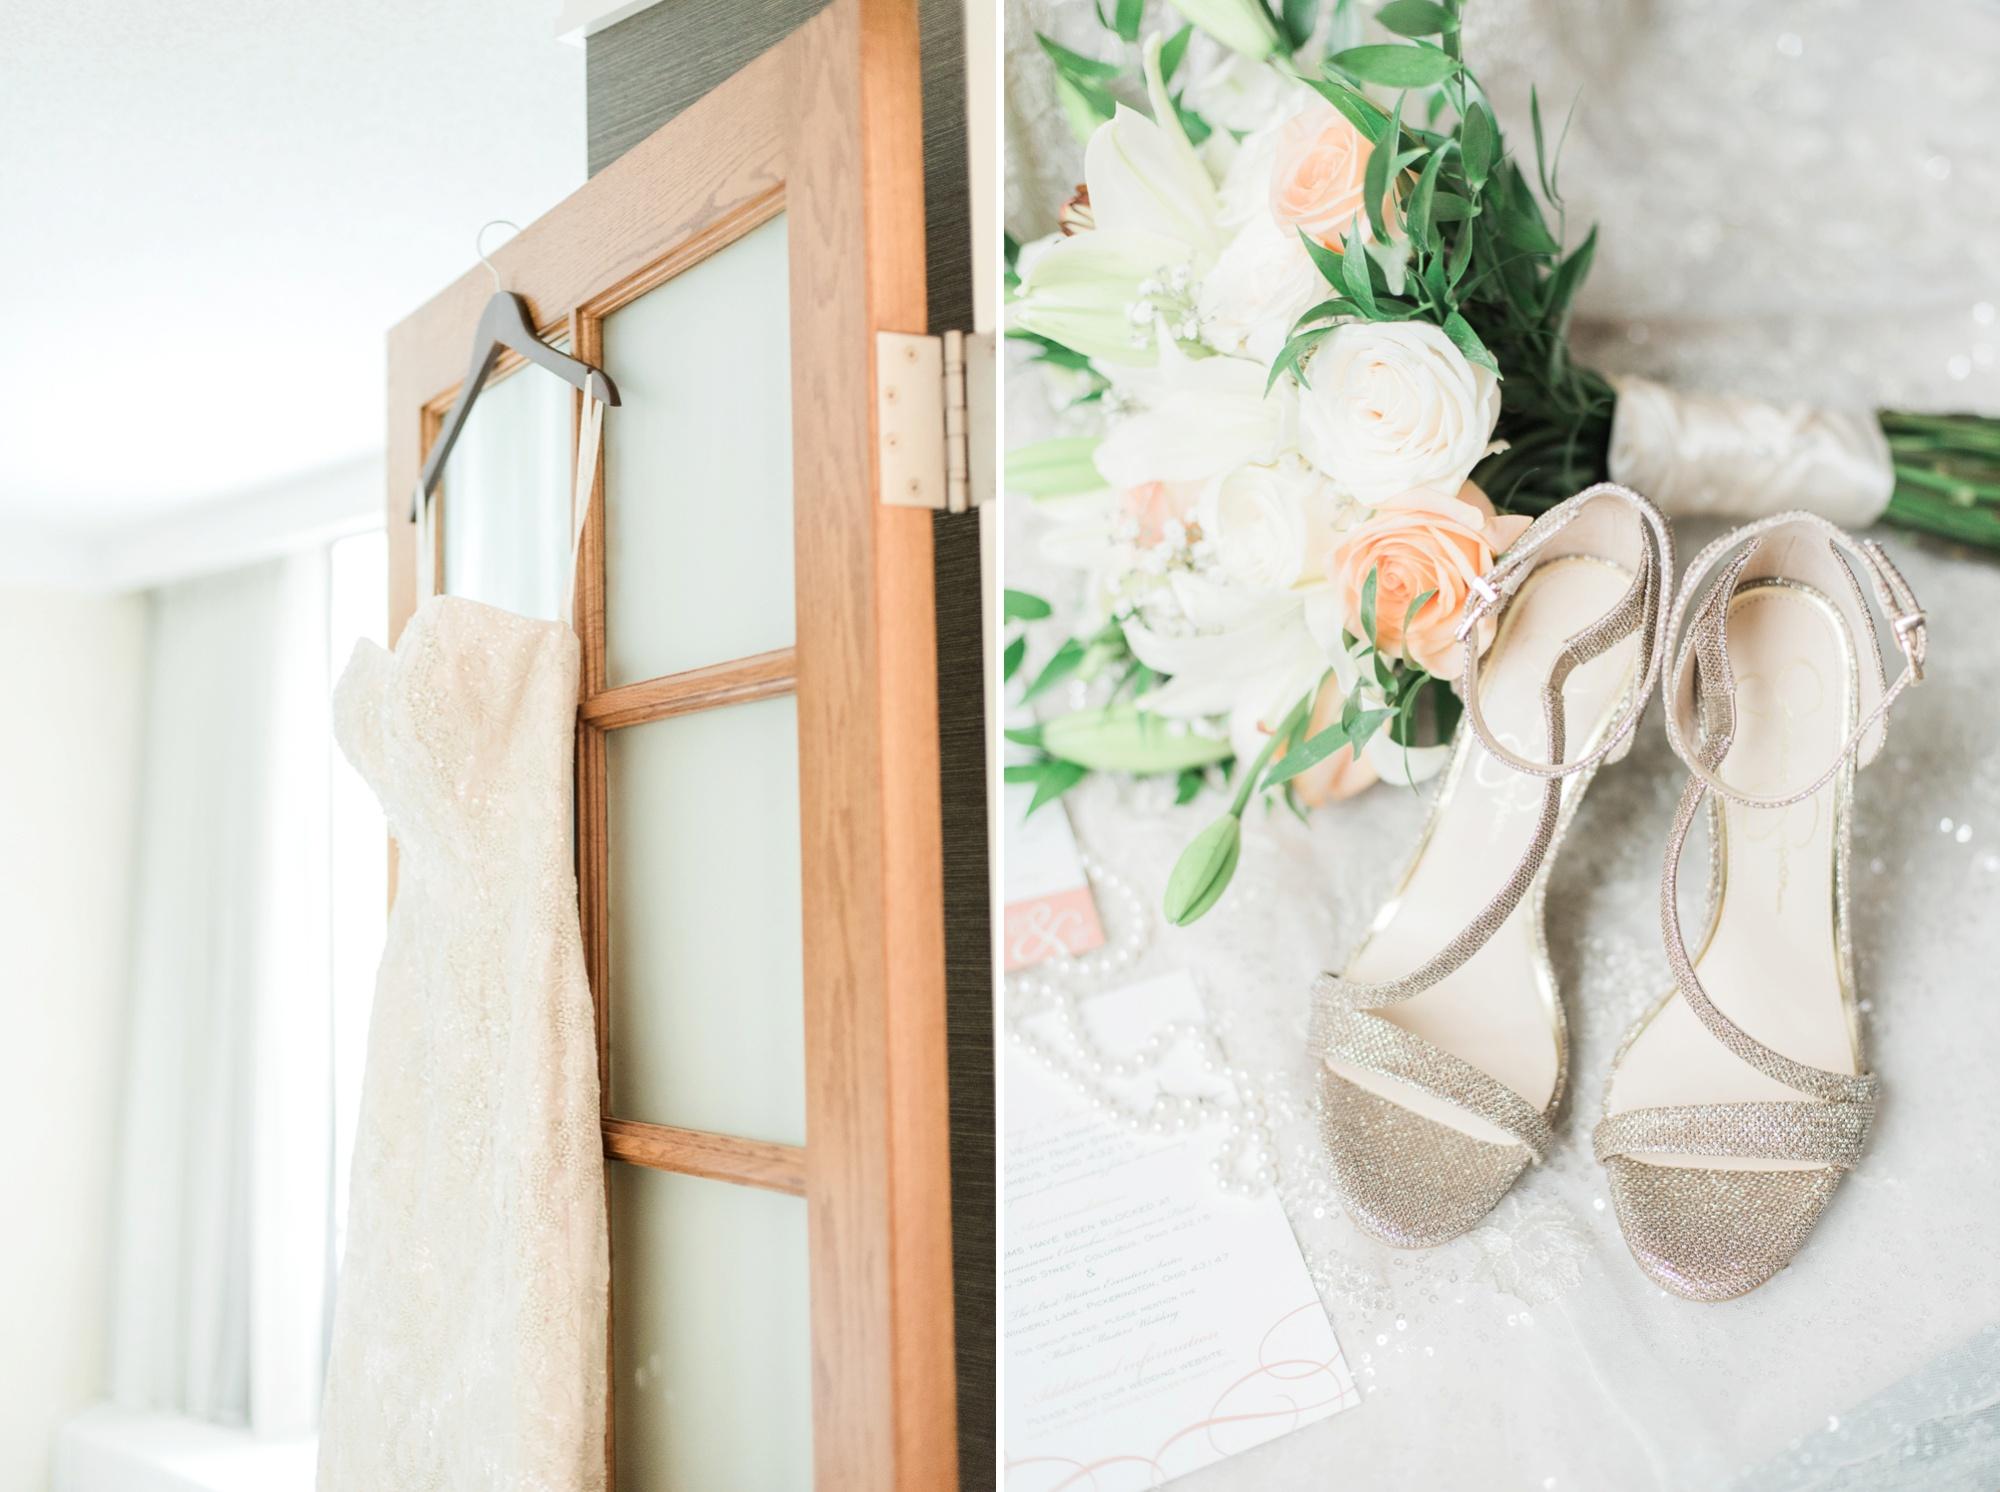 via-vecchia-winery-wedding-columbus-ohio-14.jpg